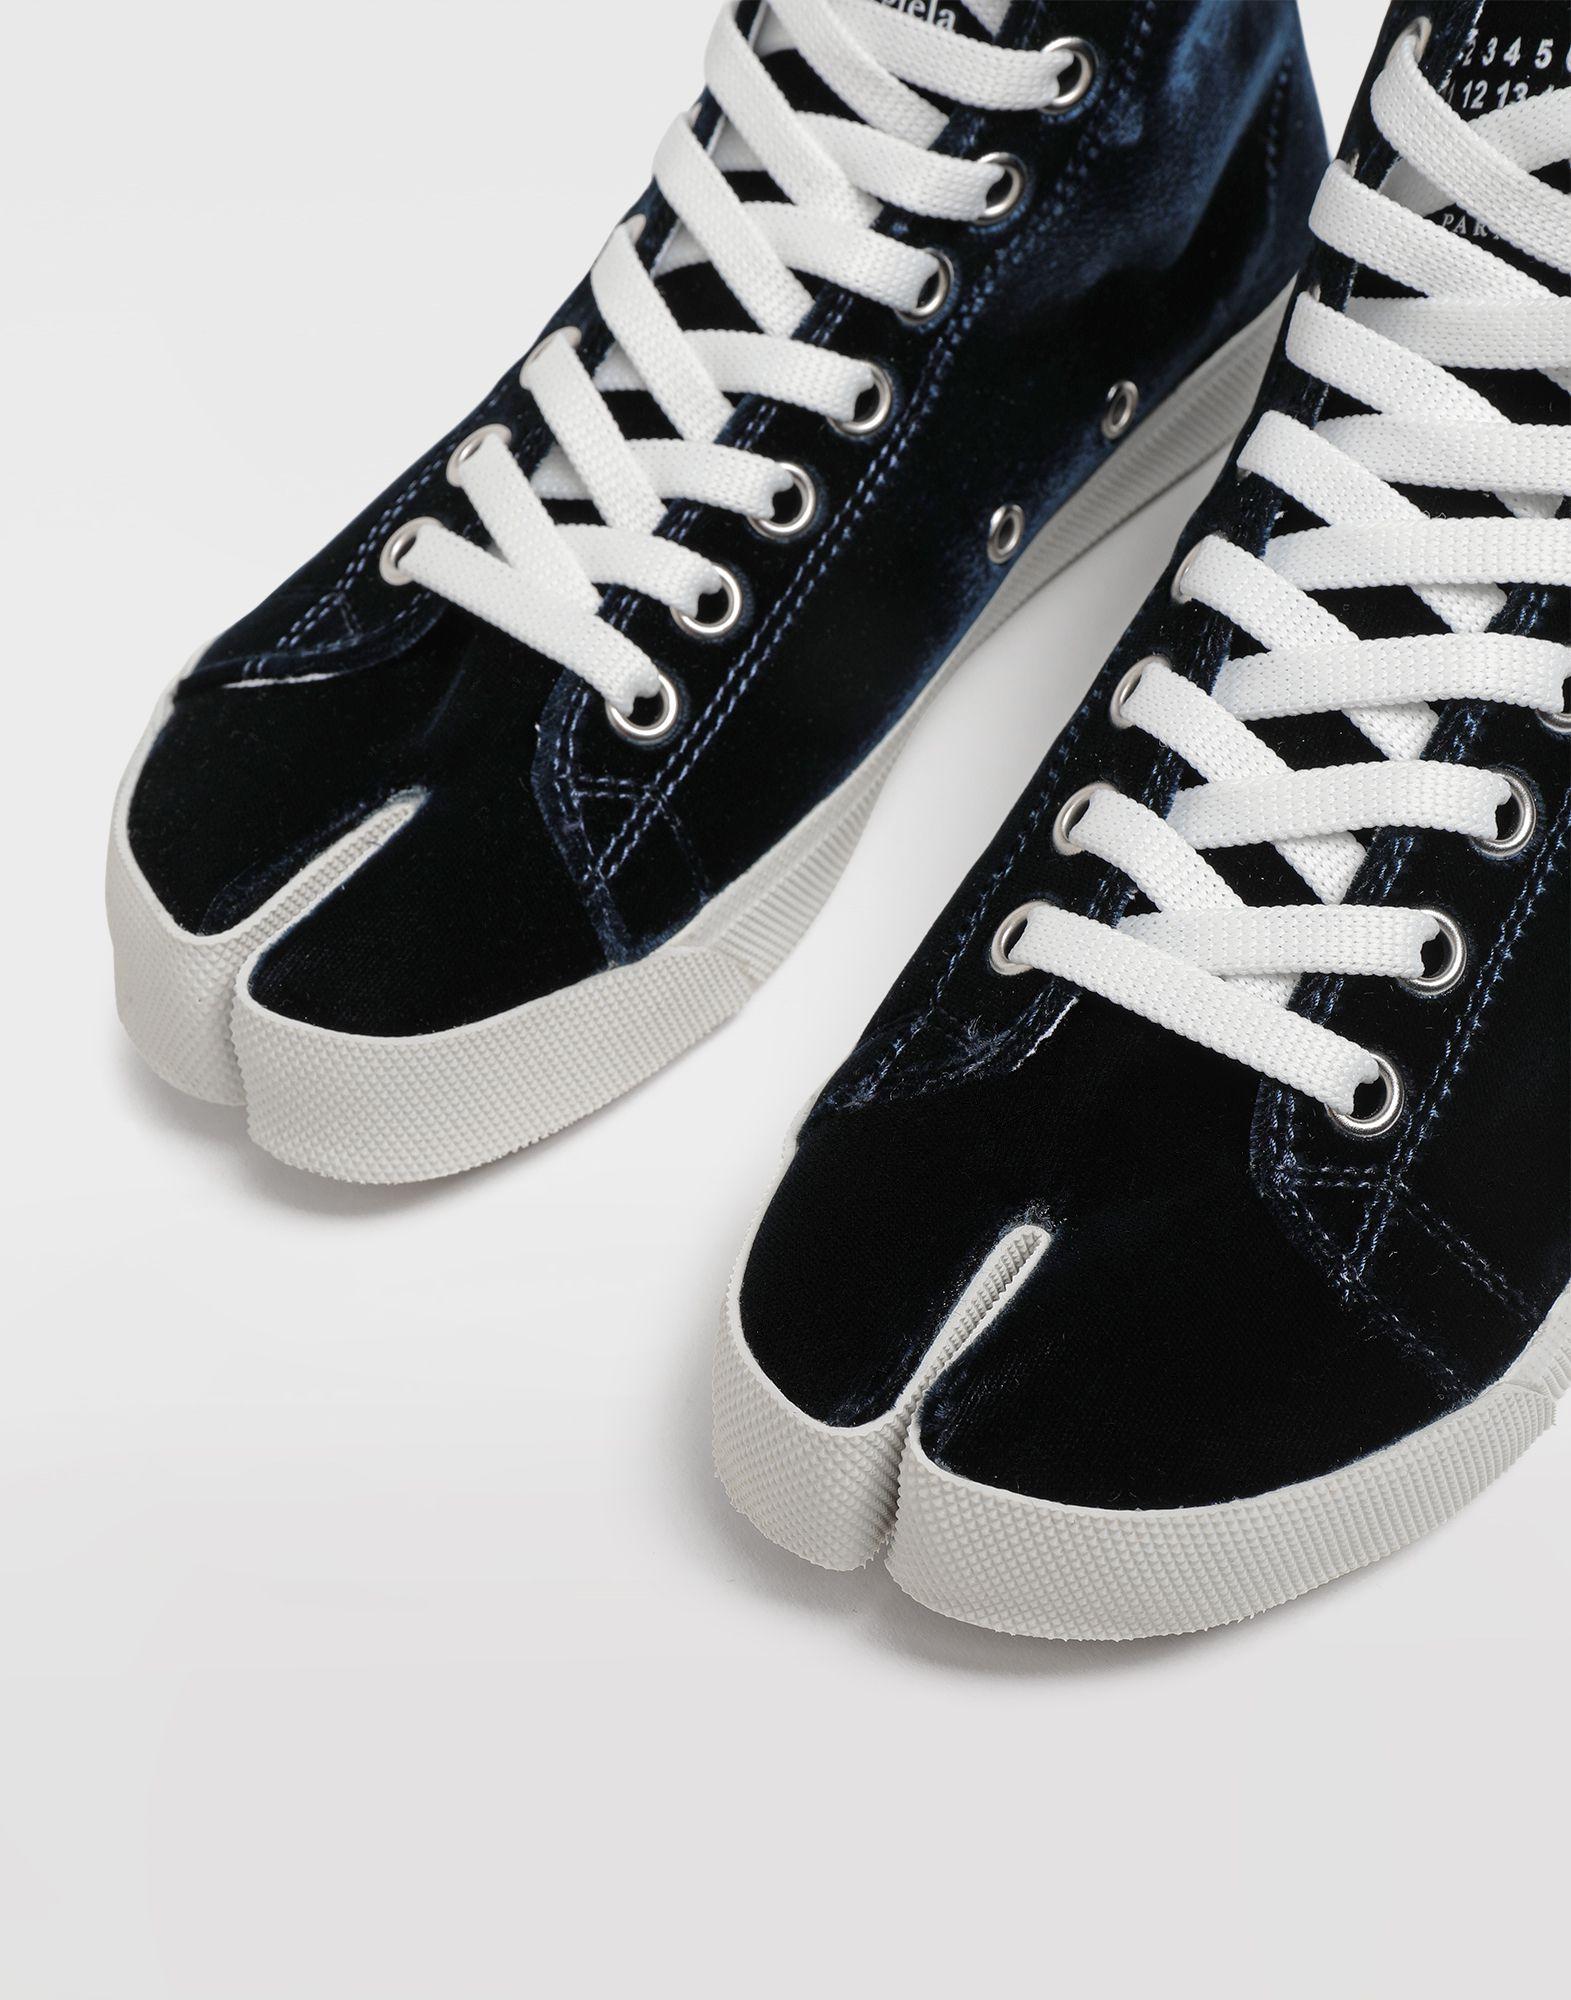 MAISON MARGIELA Tabi high-top velvet sneakers Sneakers Tabi Woman b